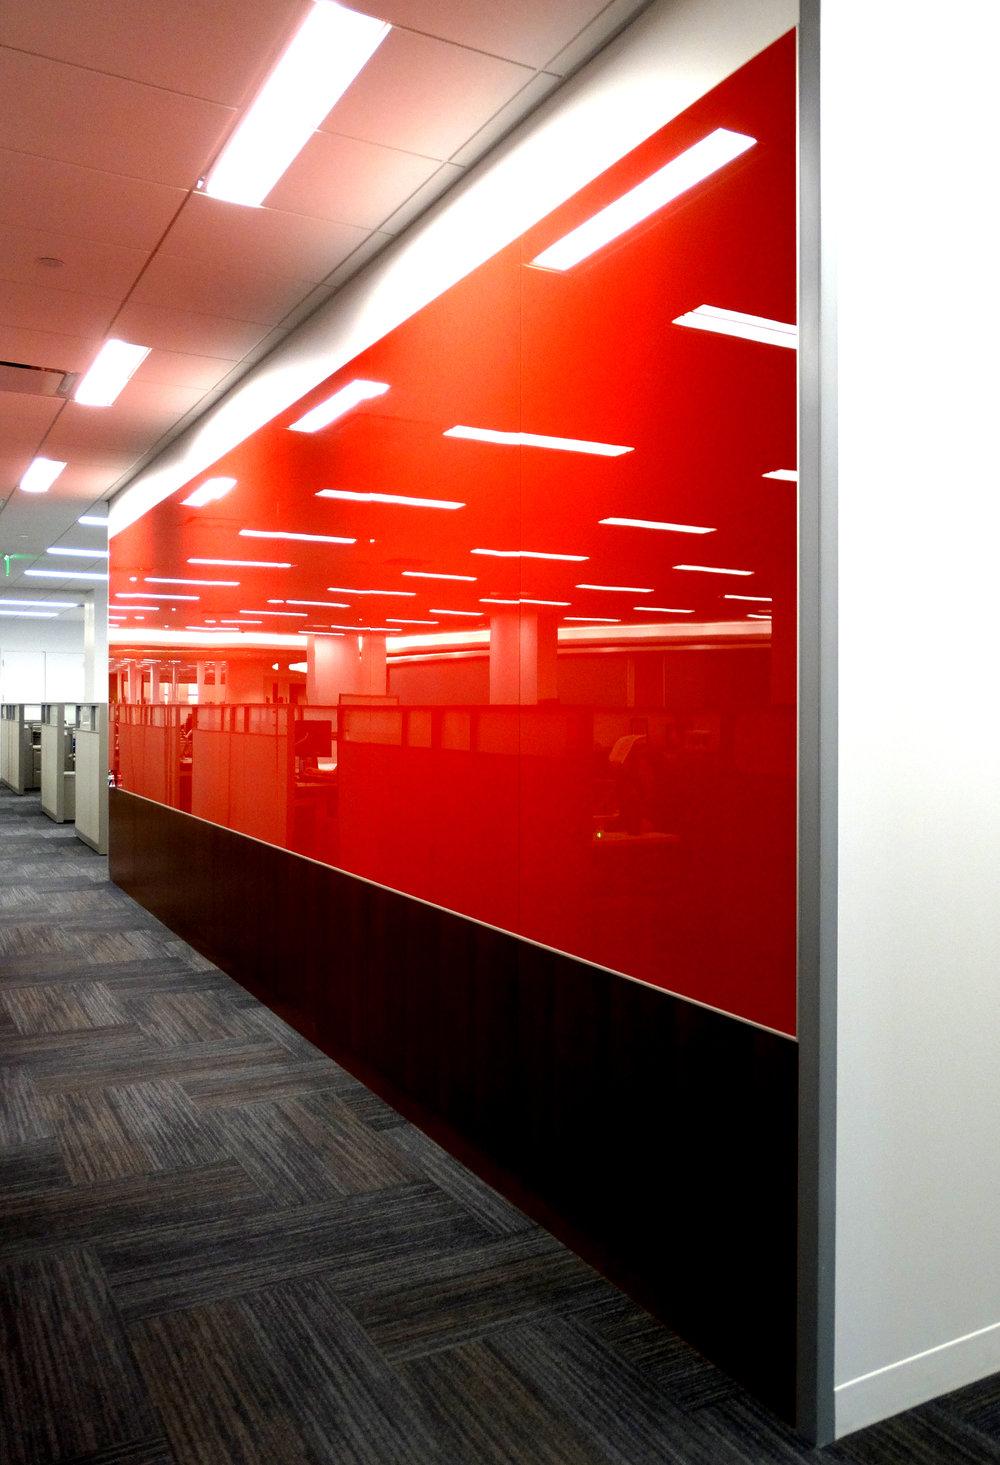 Custom Color Red Full Height Marker Board Millwork - Spaceworks AI.jpg